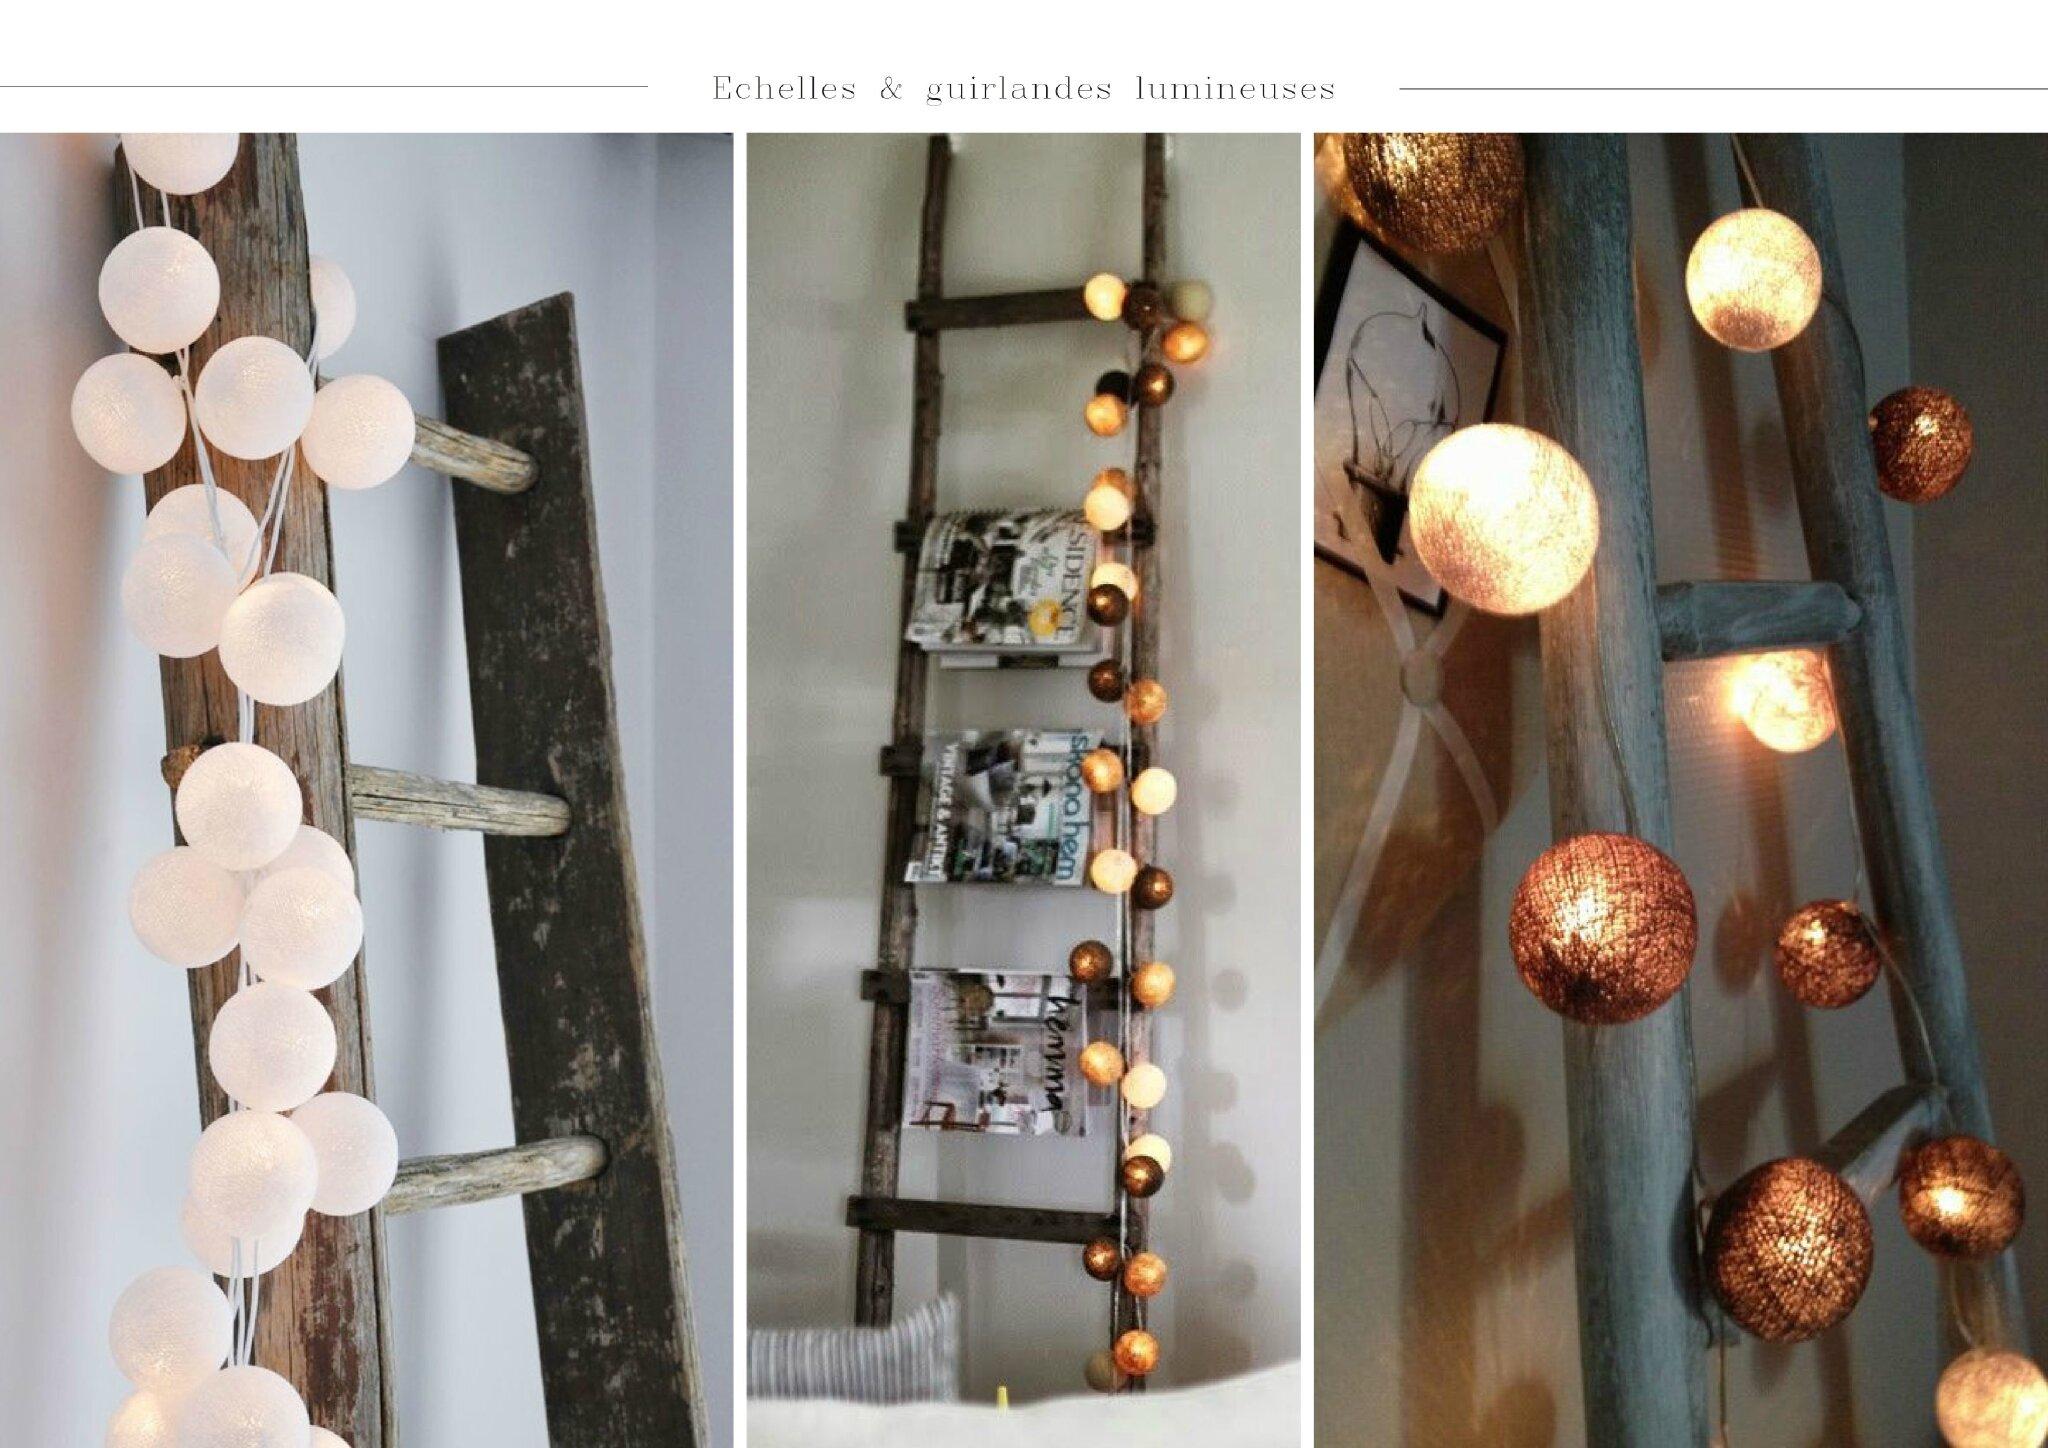 beau guirlande lumineuse deco chambre. Black Bedroom Furniture Sets. Home Design Ideas